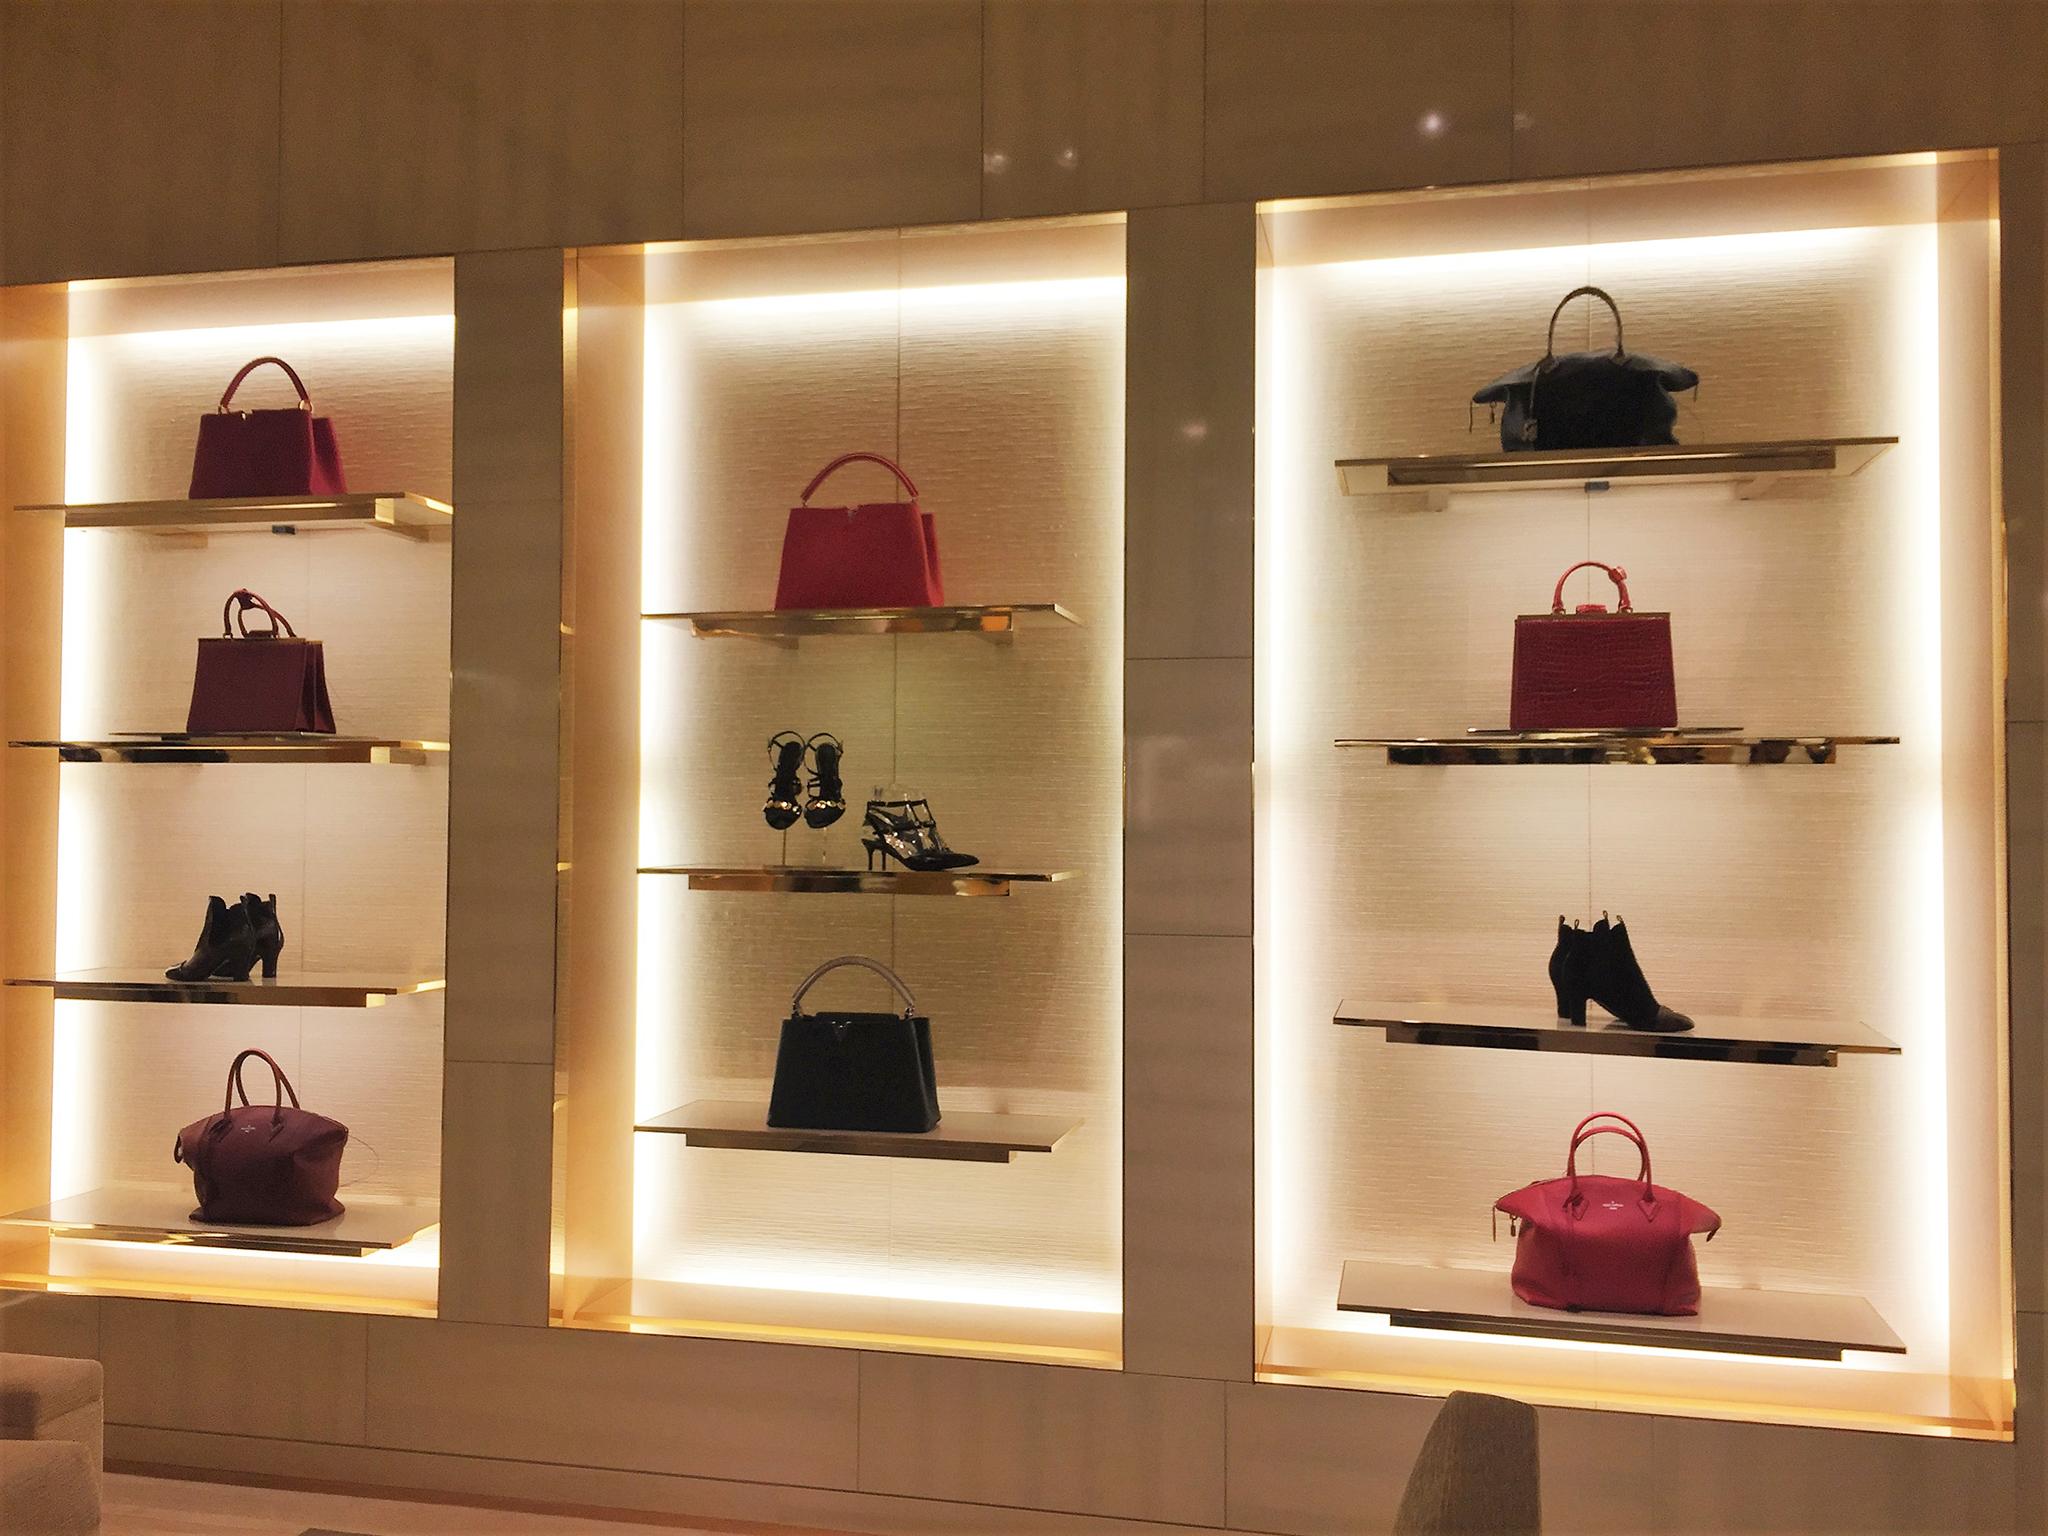 Louis-Vuitton-Saks-5th-Ave-03